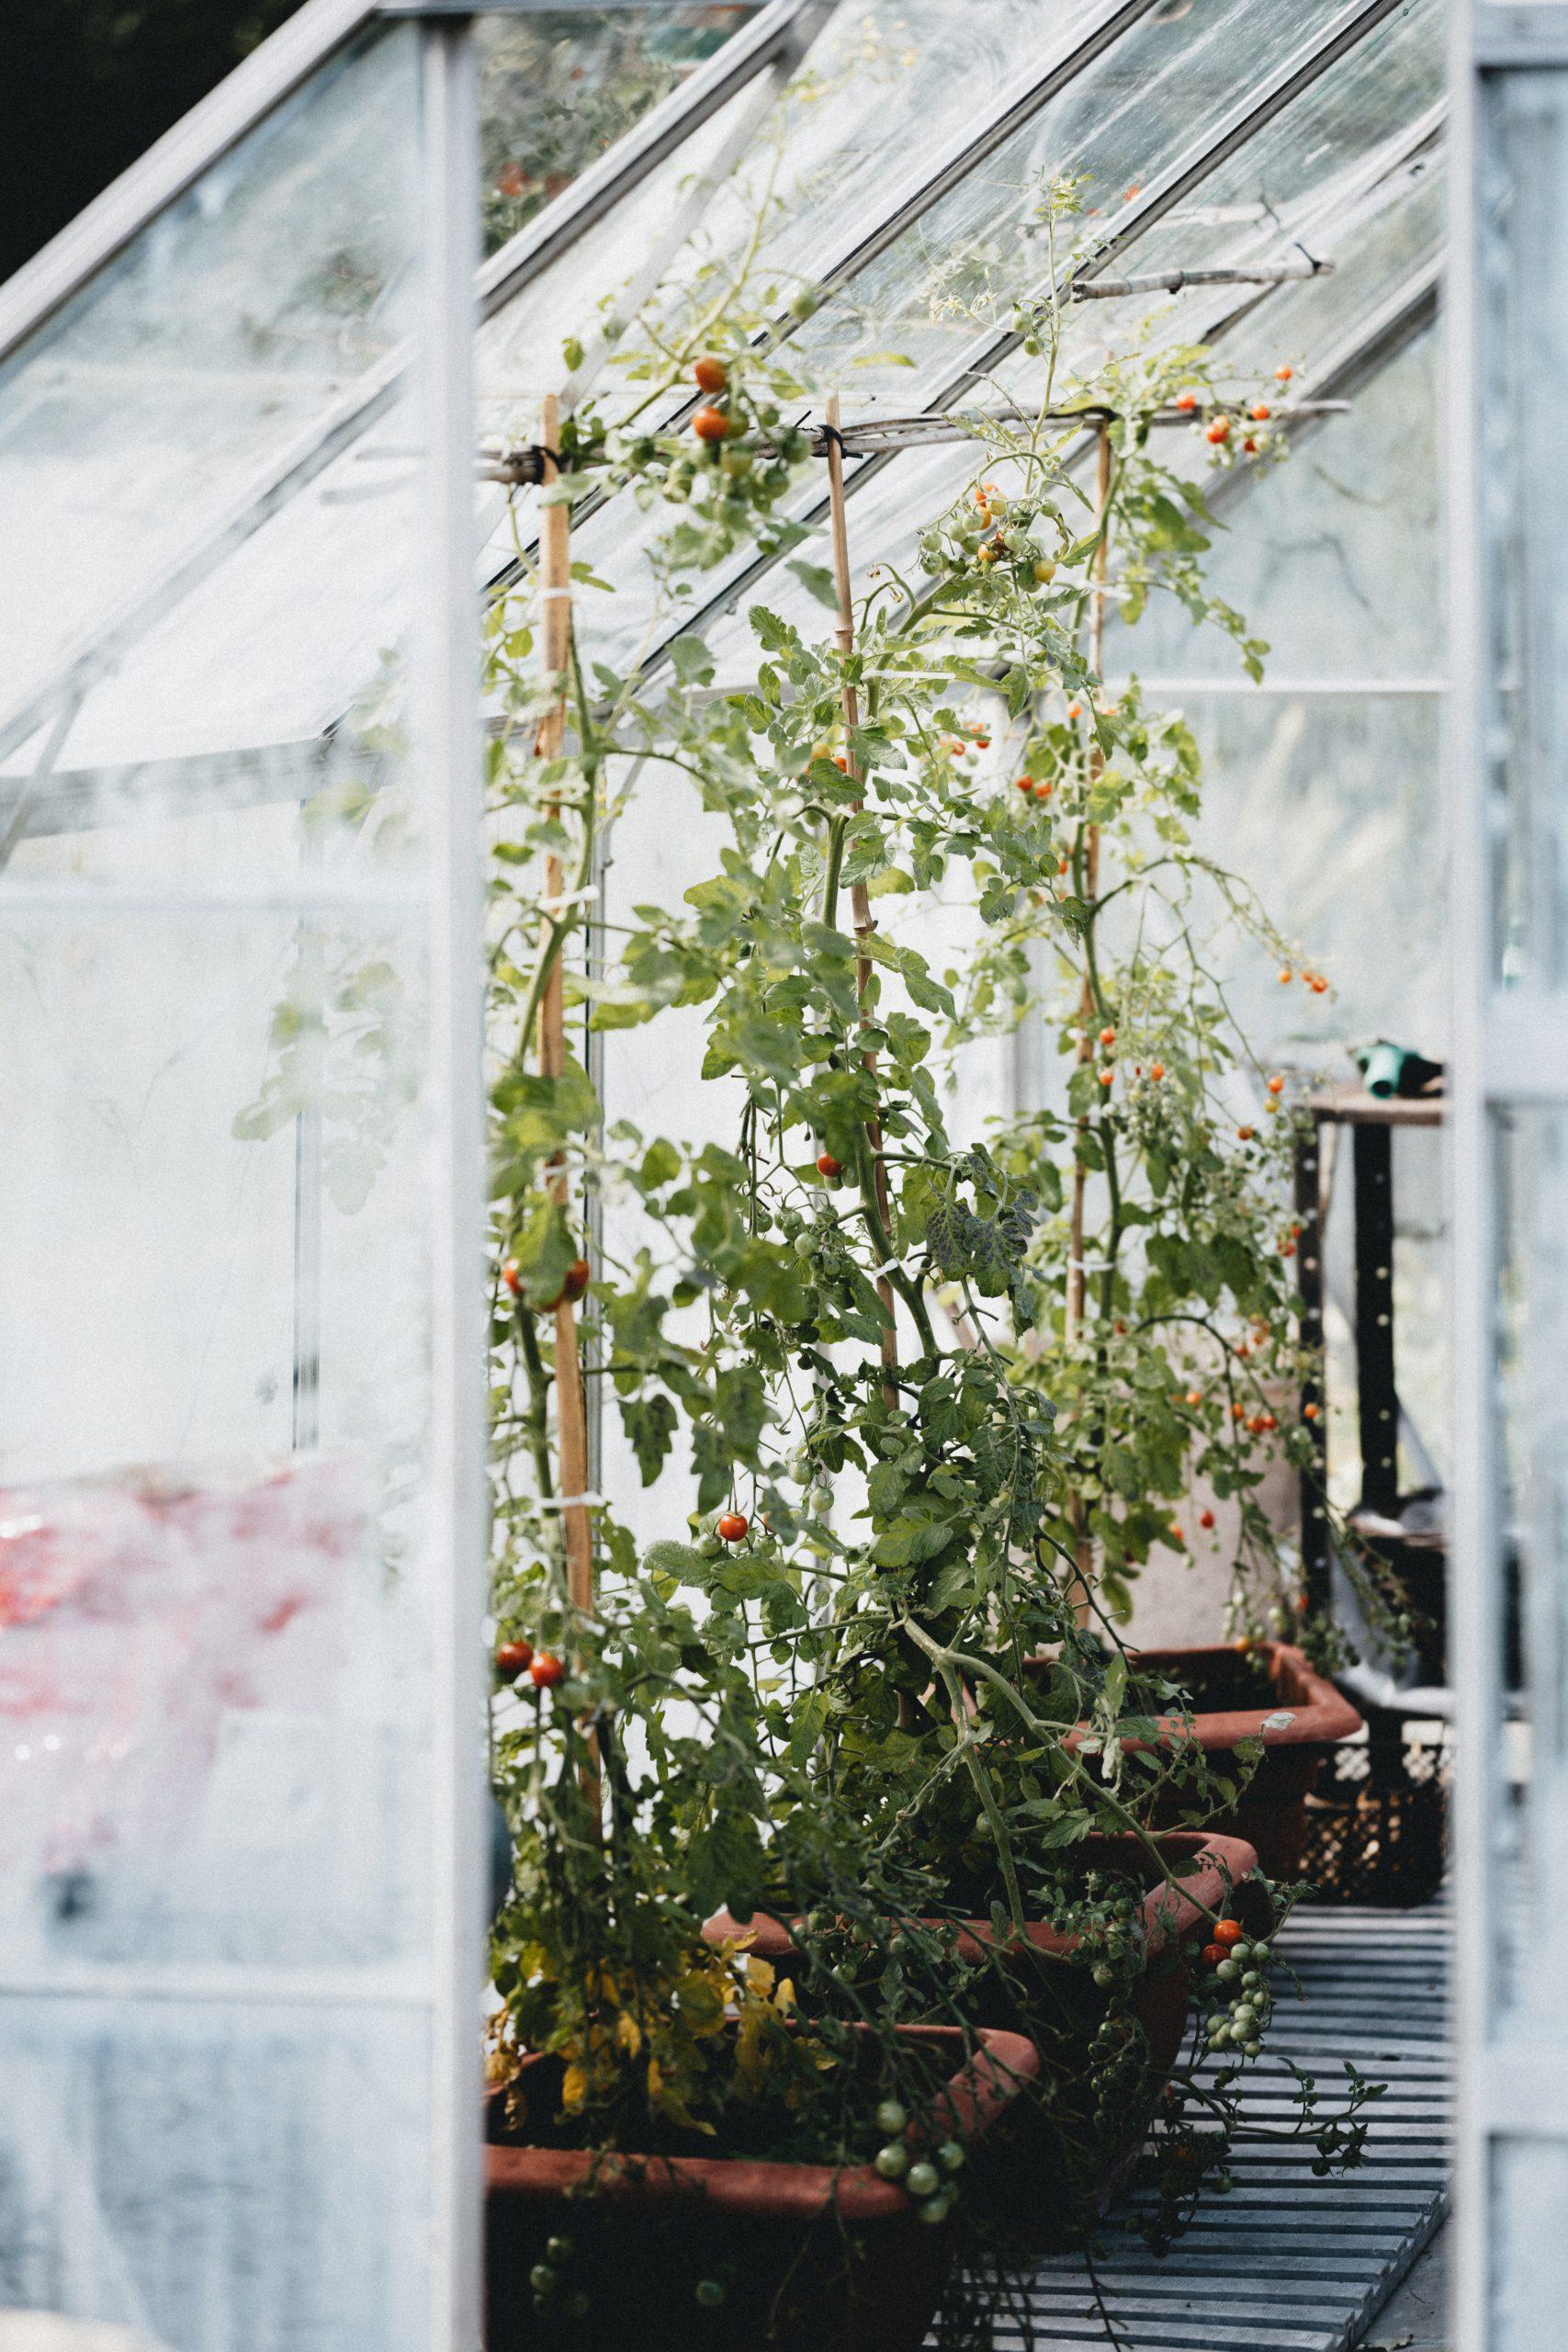 tomatoe tree in greenhouse